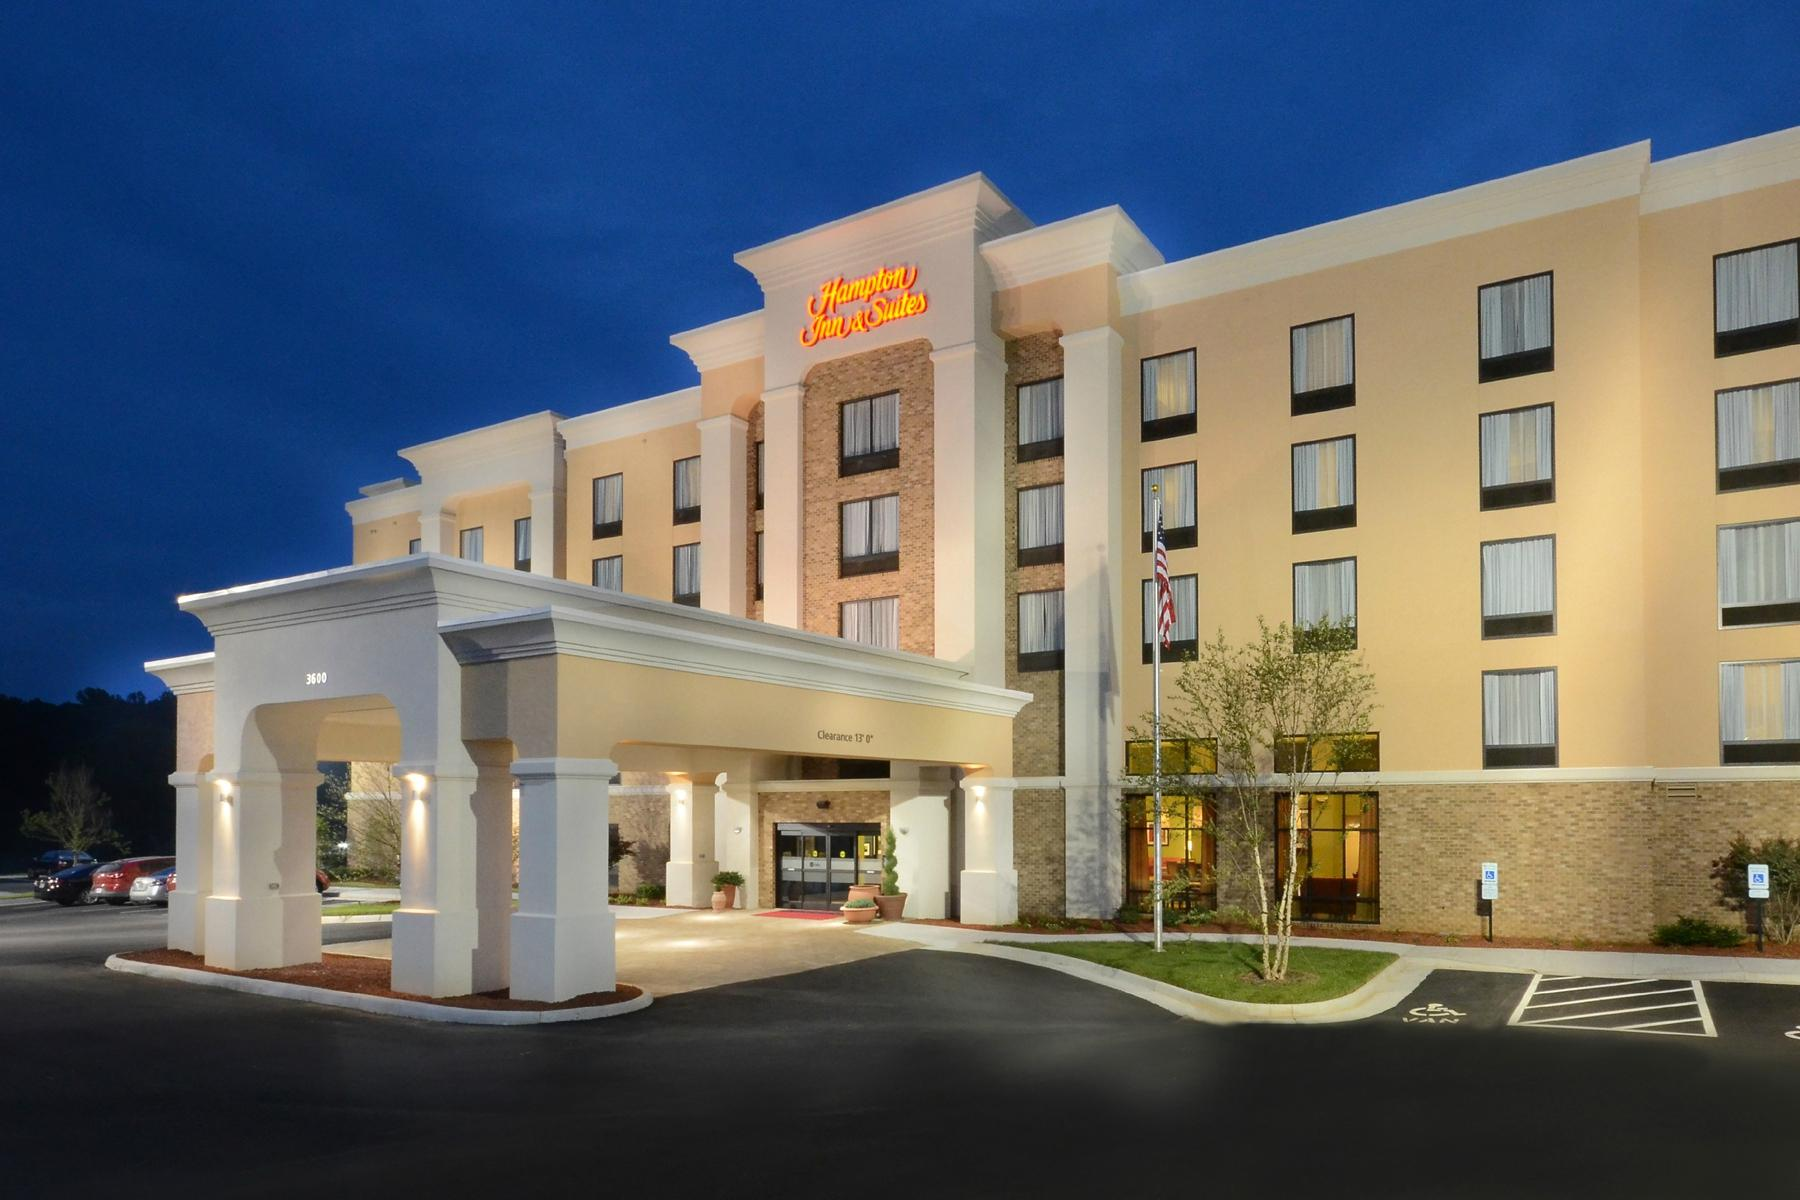 Hampton Inn Suites Lynchburg